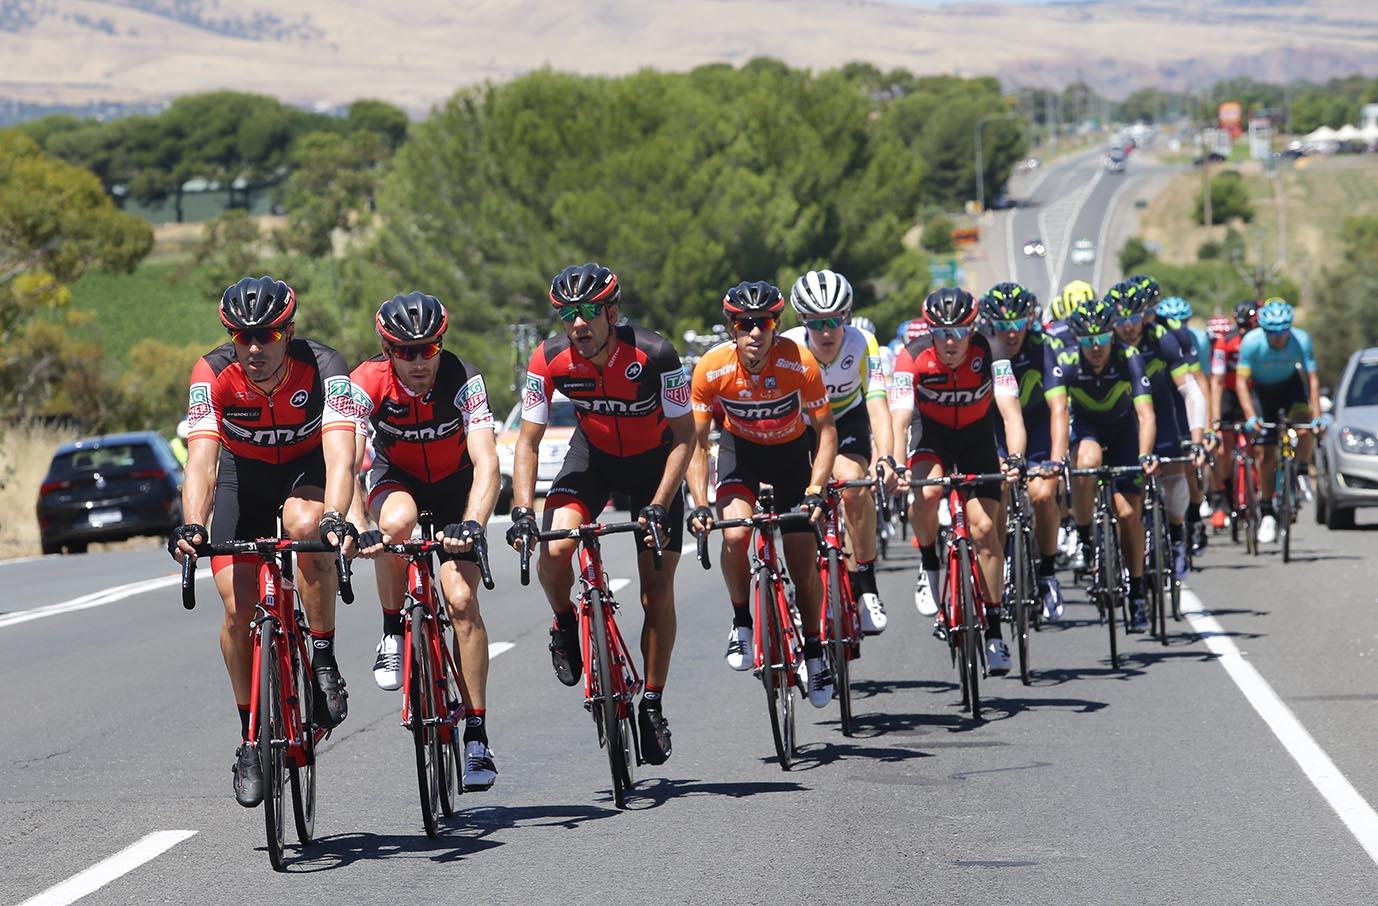 BMC Racing leads the peloton during BikeExchange Stage 5